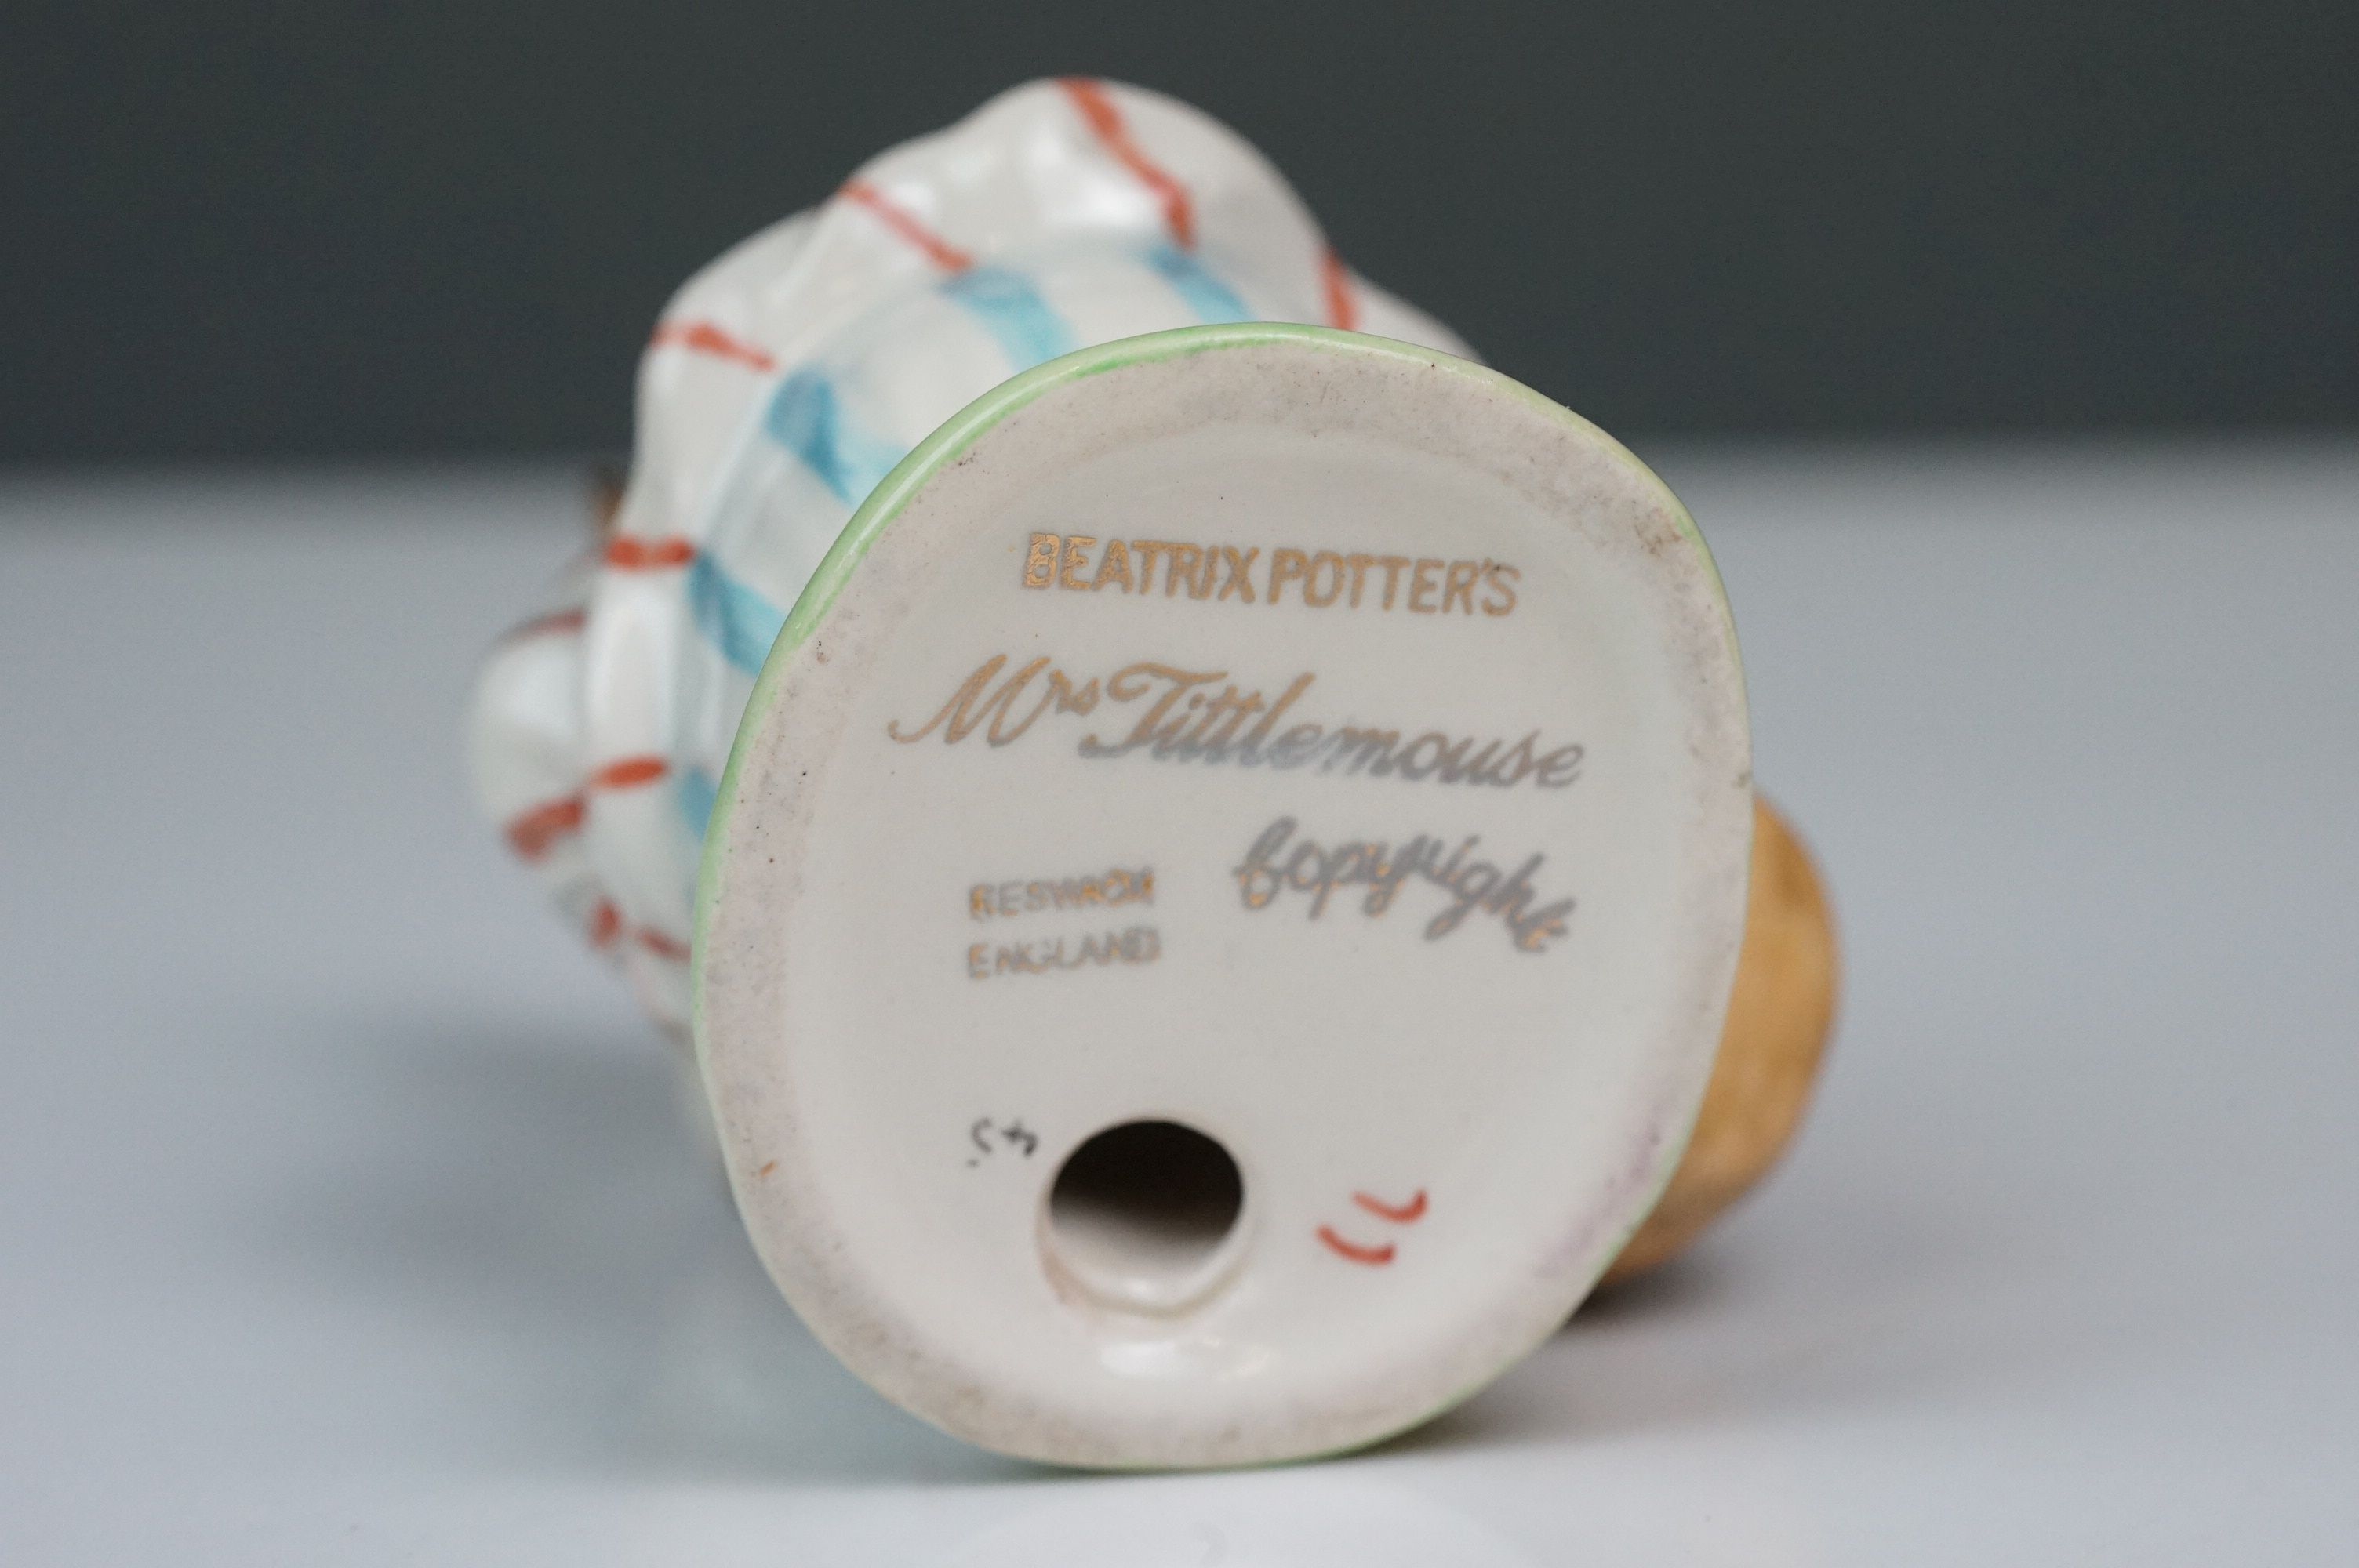 Beswick Beatrix Potter's Mrs Tittlemouse, style one, BP 1A No. 1103 - Image 5 of 5